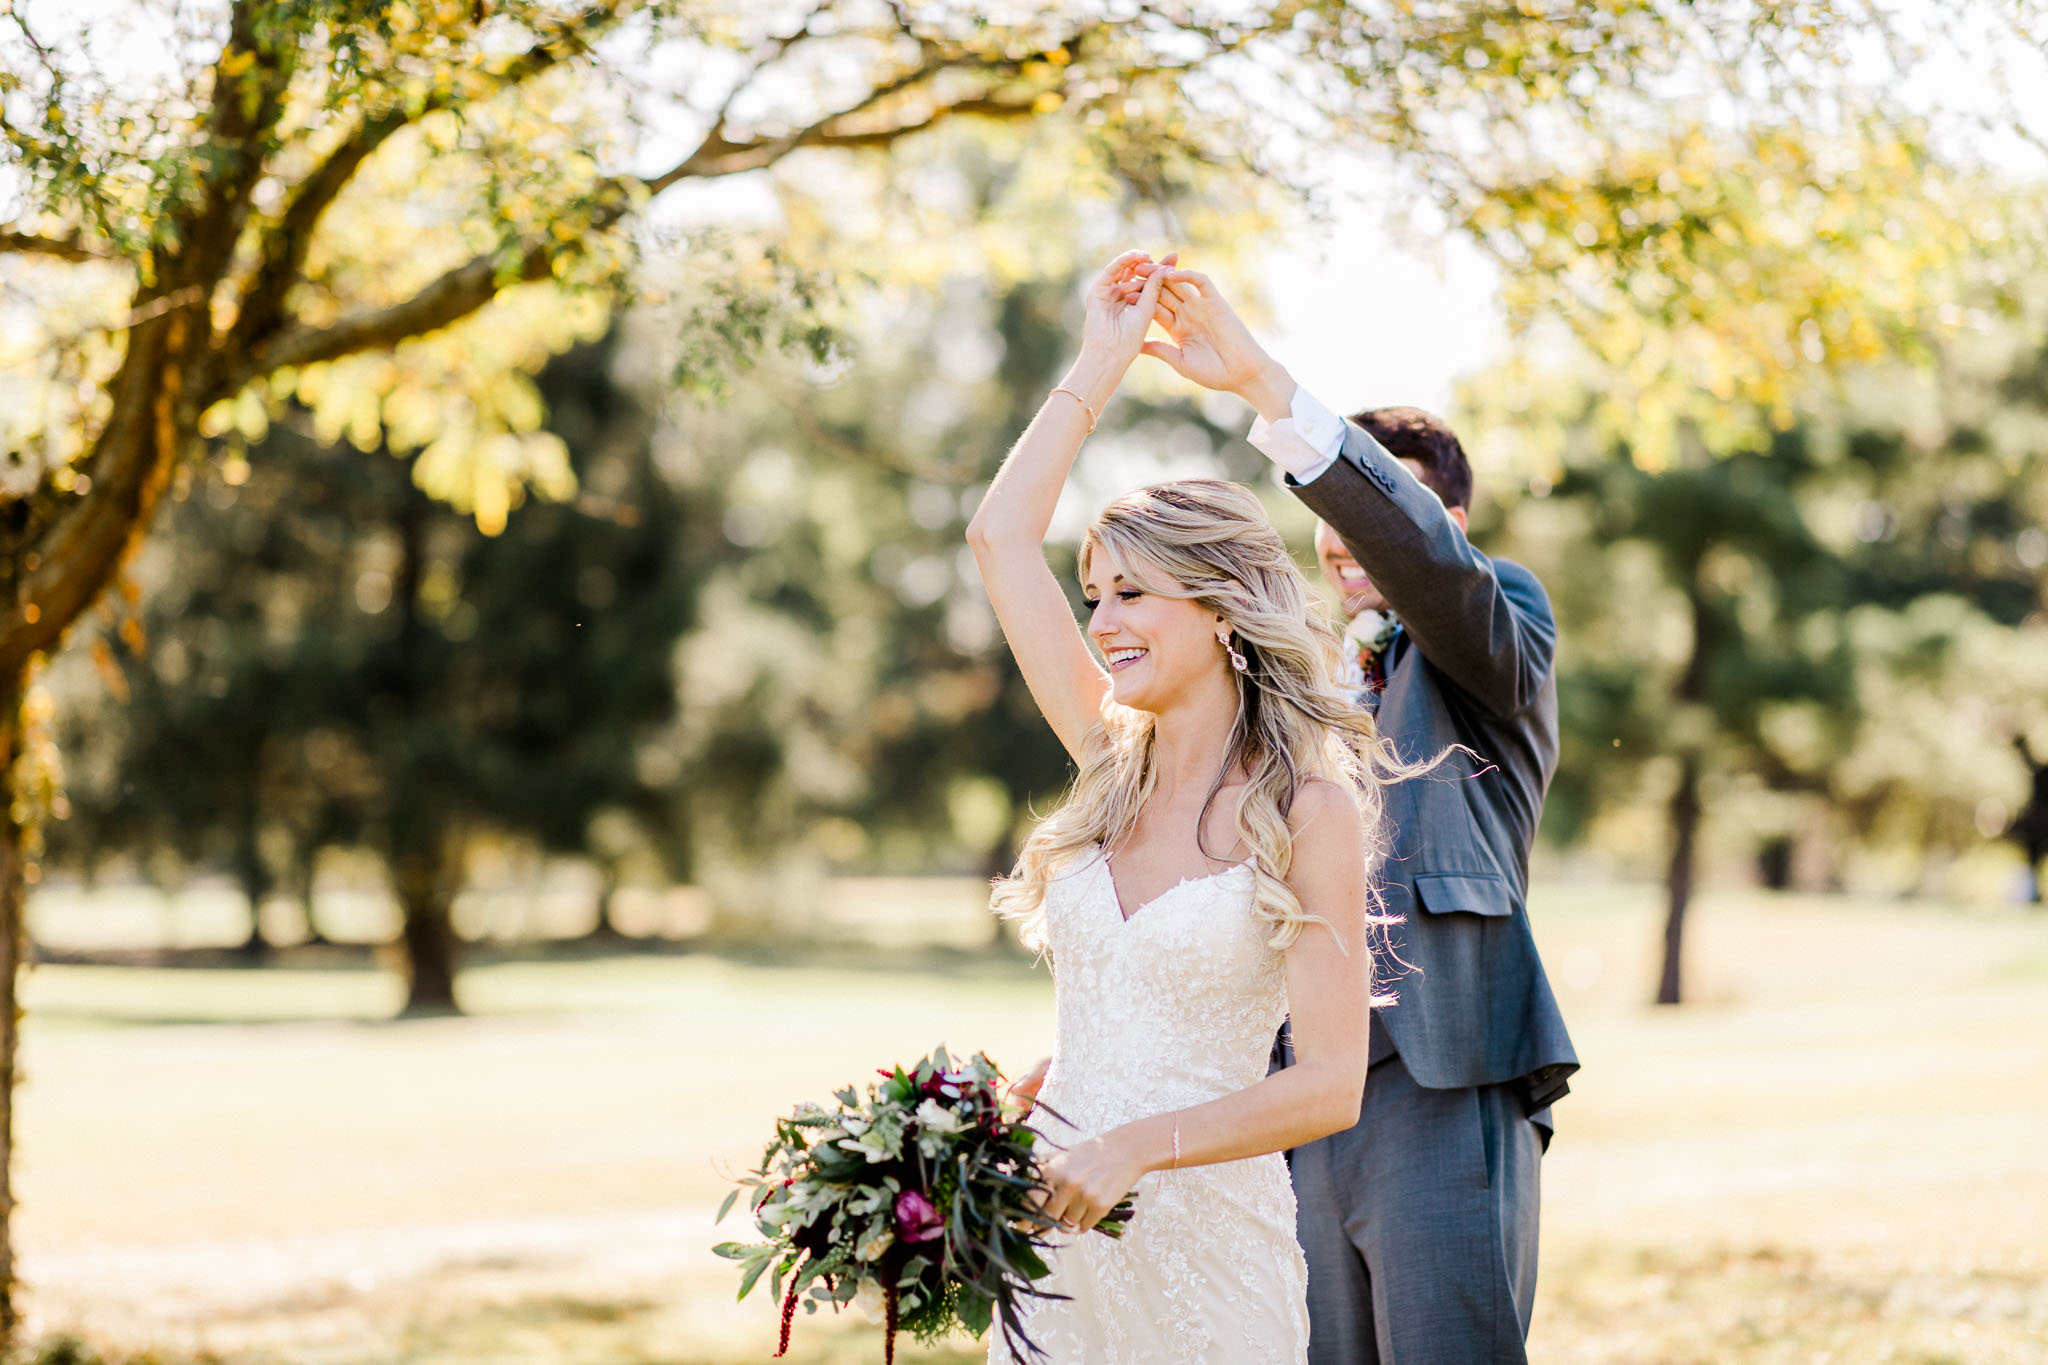 Frosty-Valley-September-Wedding-7507.jpg